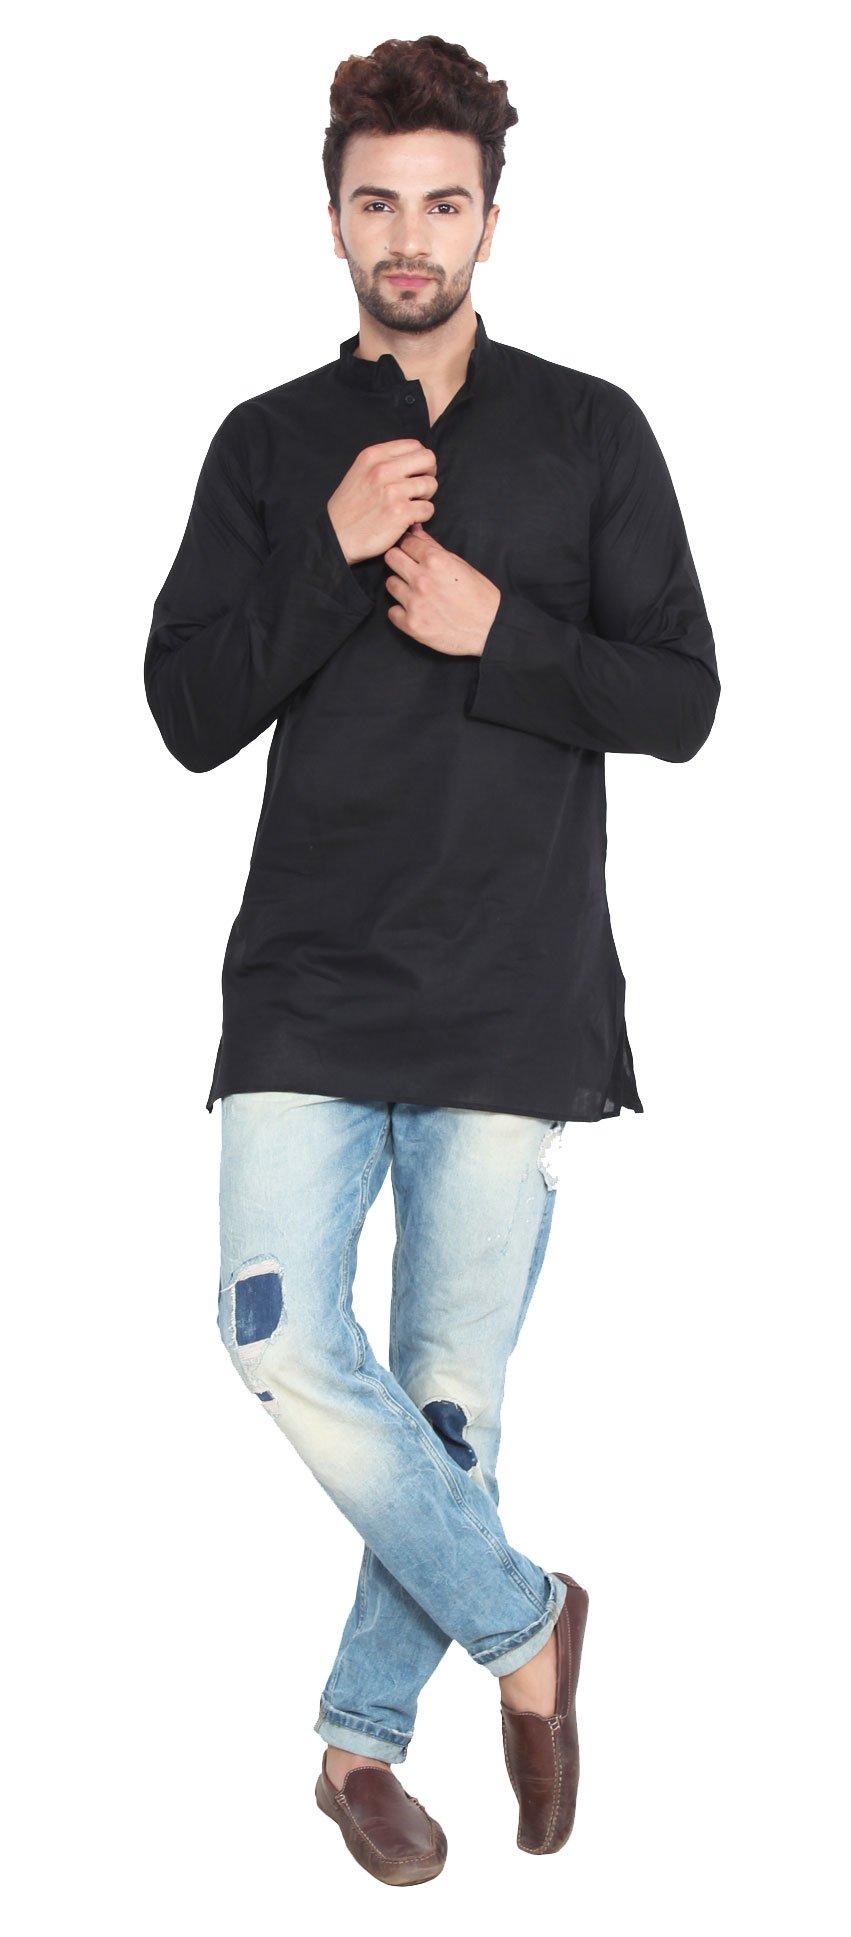 Cotton Dress Mens Short Kurta Shirt India Fashion Clothes (Black, M) by Maple Clothing (Image #2)